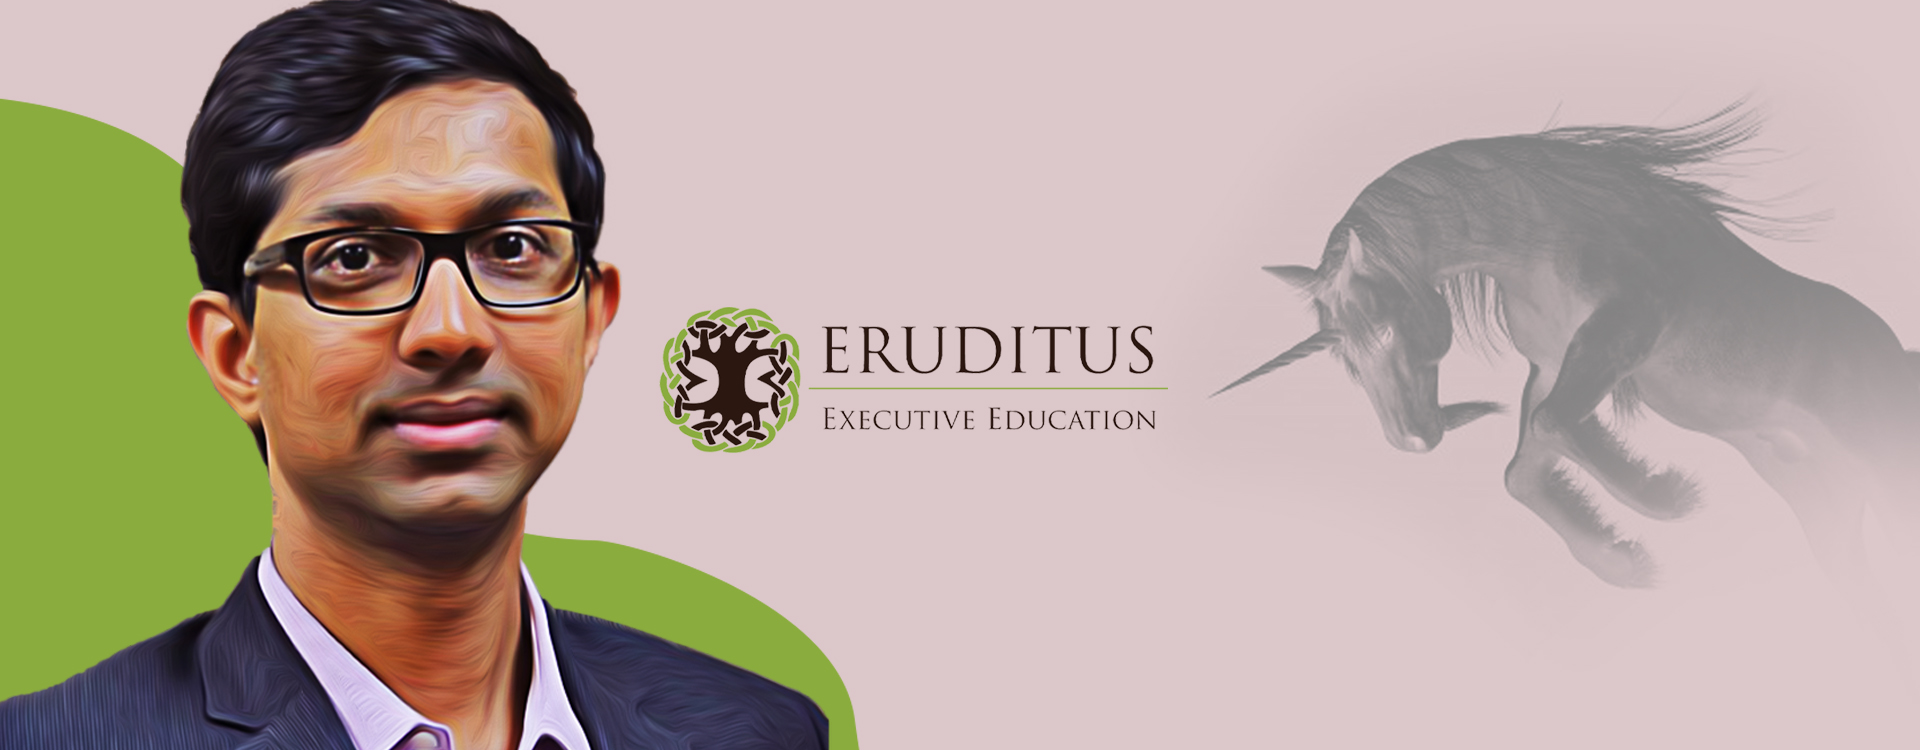 Eruditus the next big name all set to join the Unicorn club